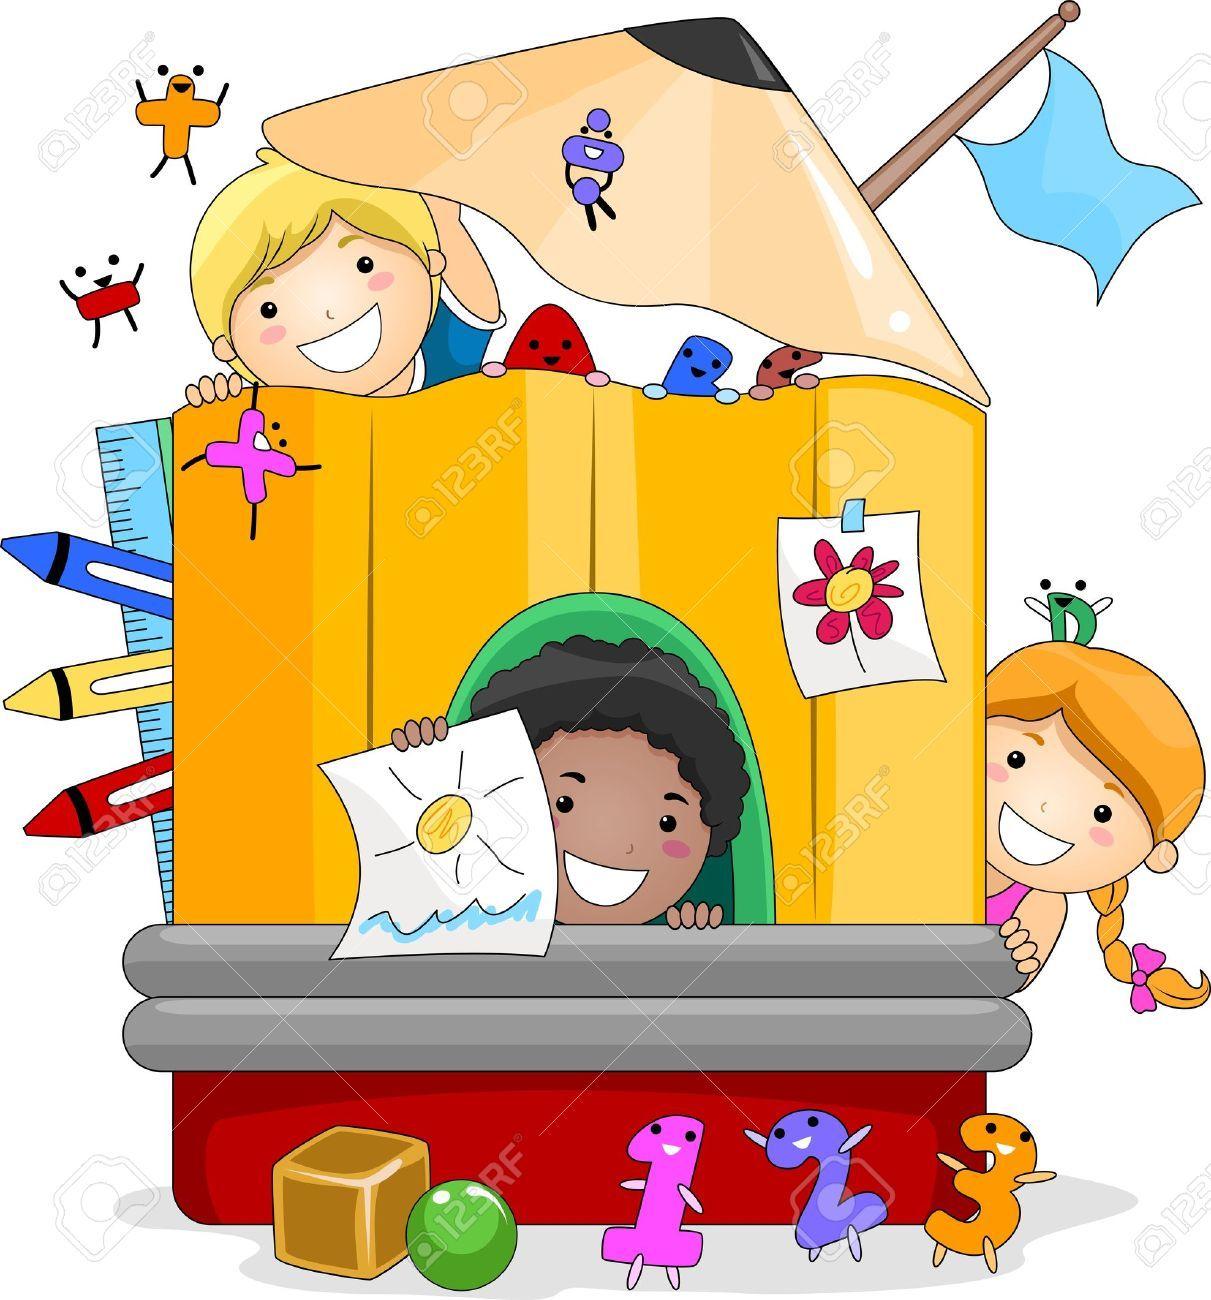 dibujos niños escuela - Buscar con Google | clipart | Pinterest ...